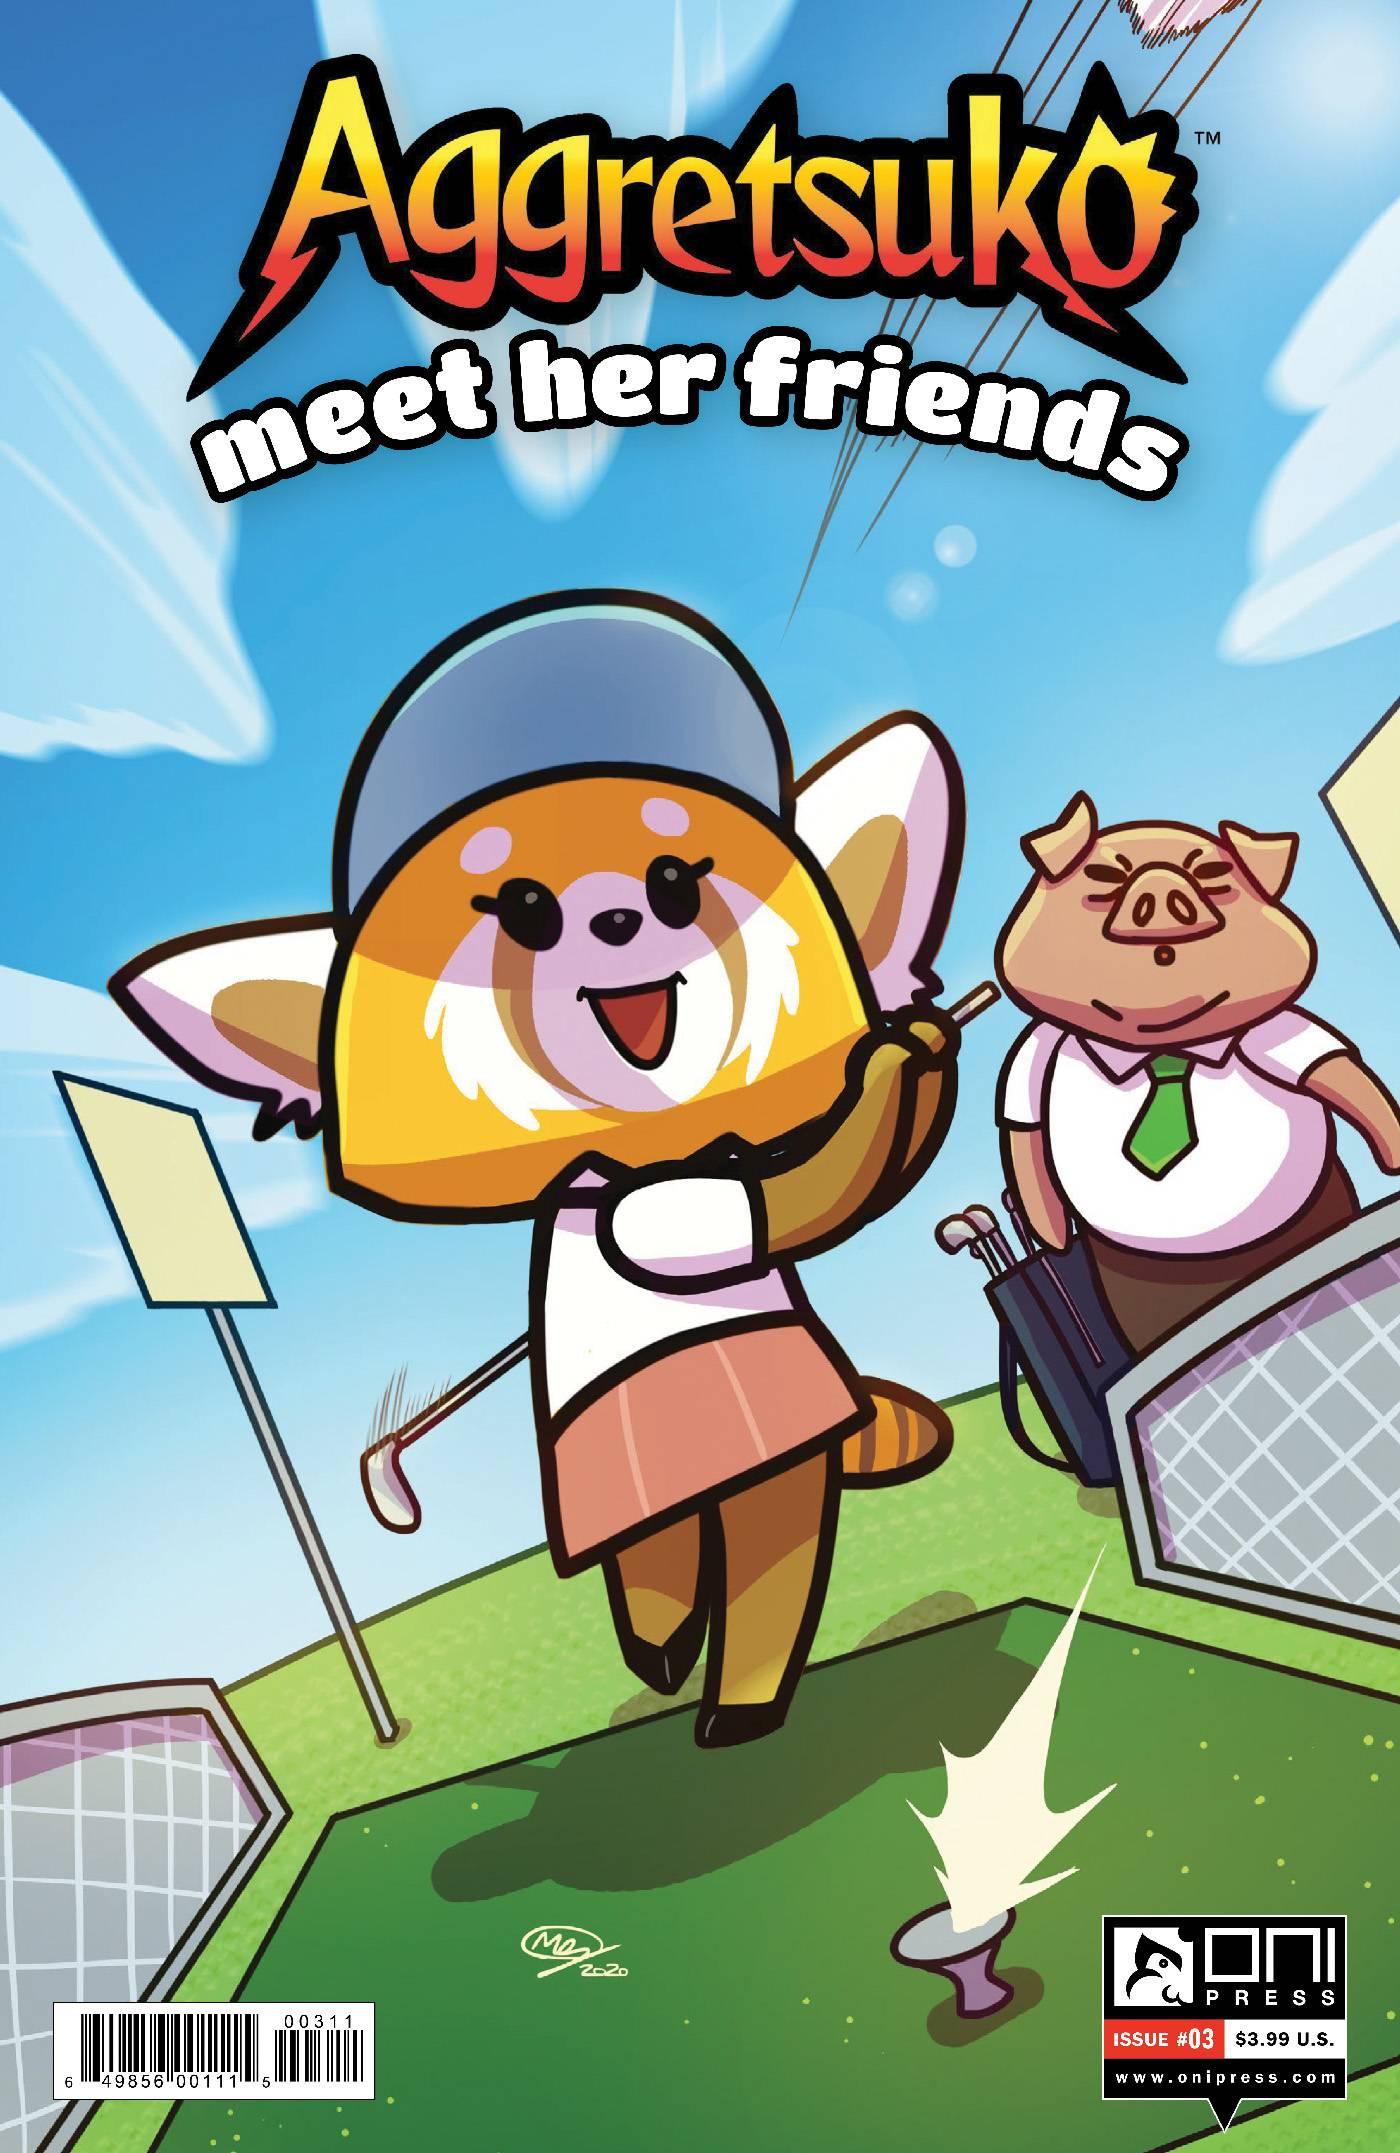 AGGRETSUKO MEET HER FRIENDS